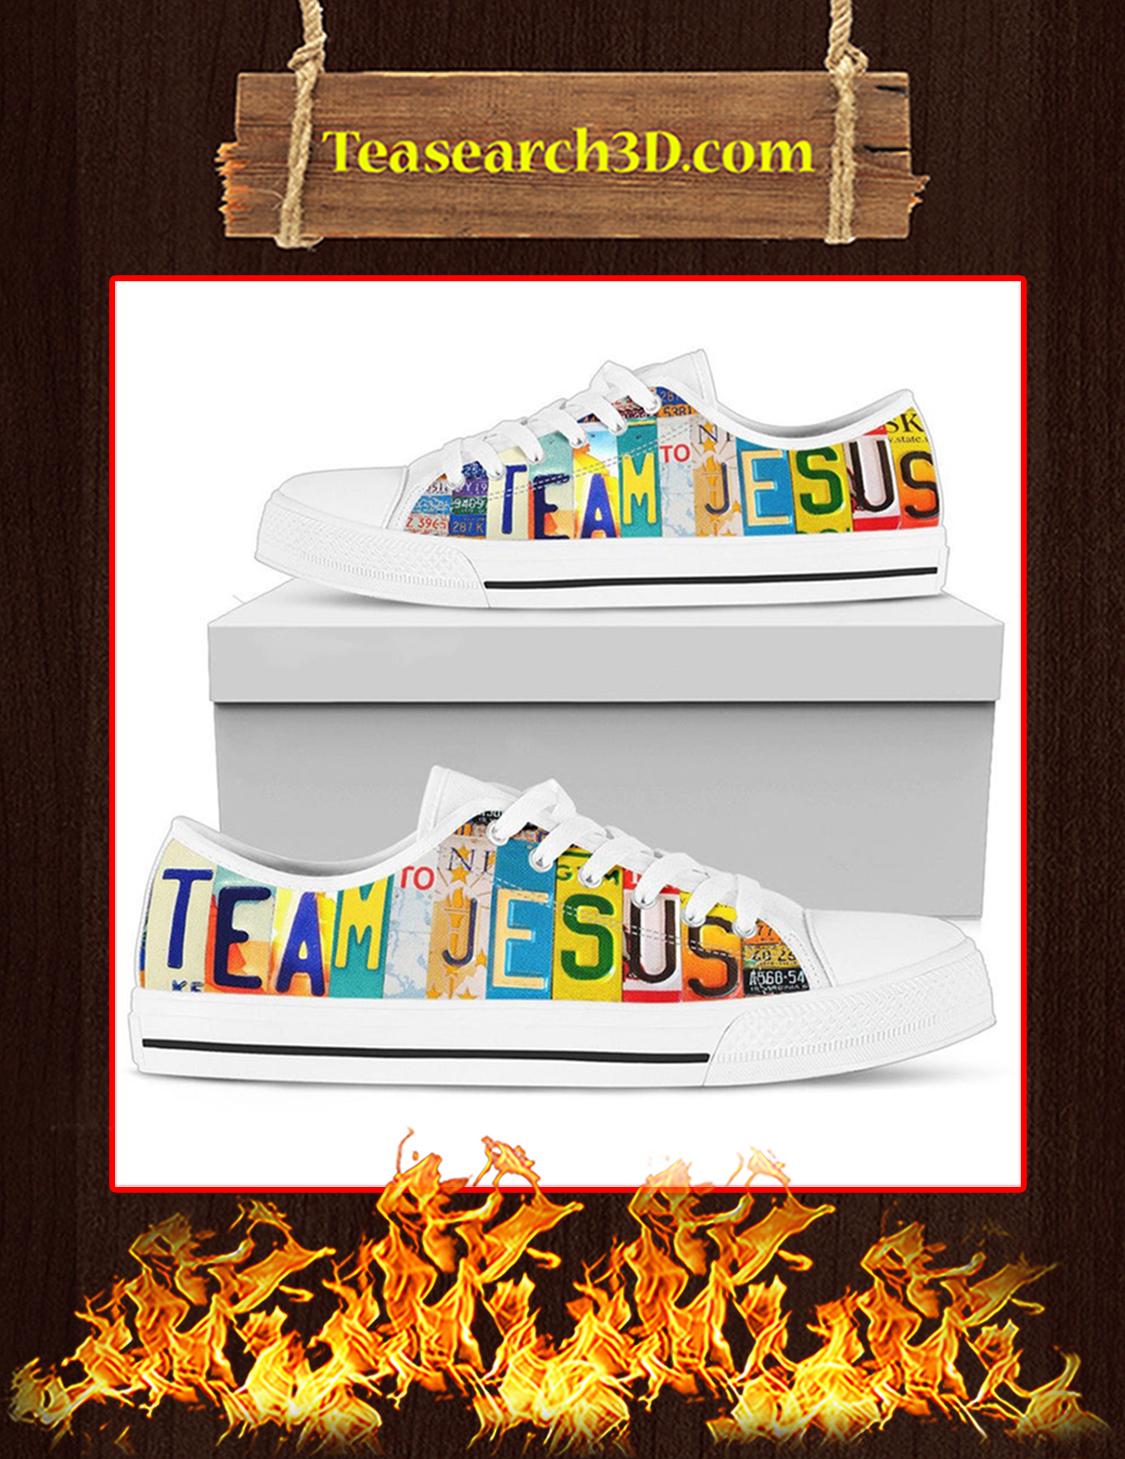 Team Jesus Low Top Shoes - Pic 3